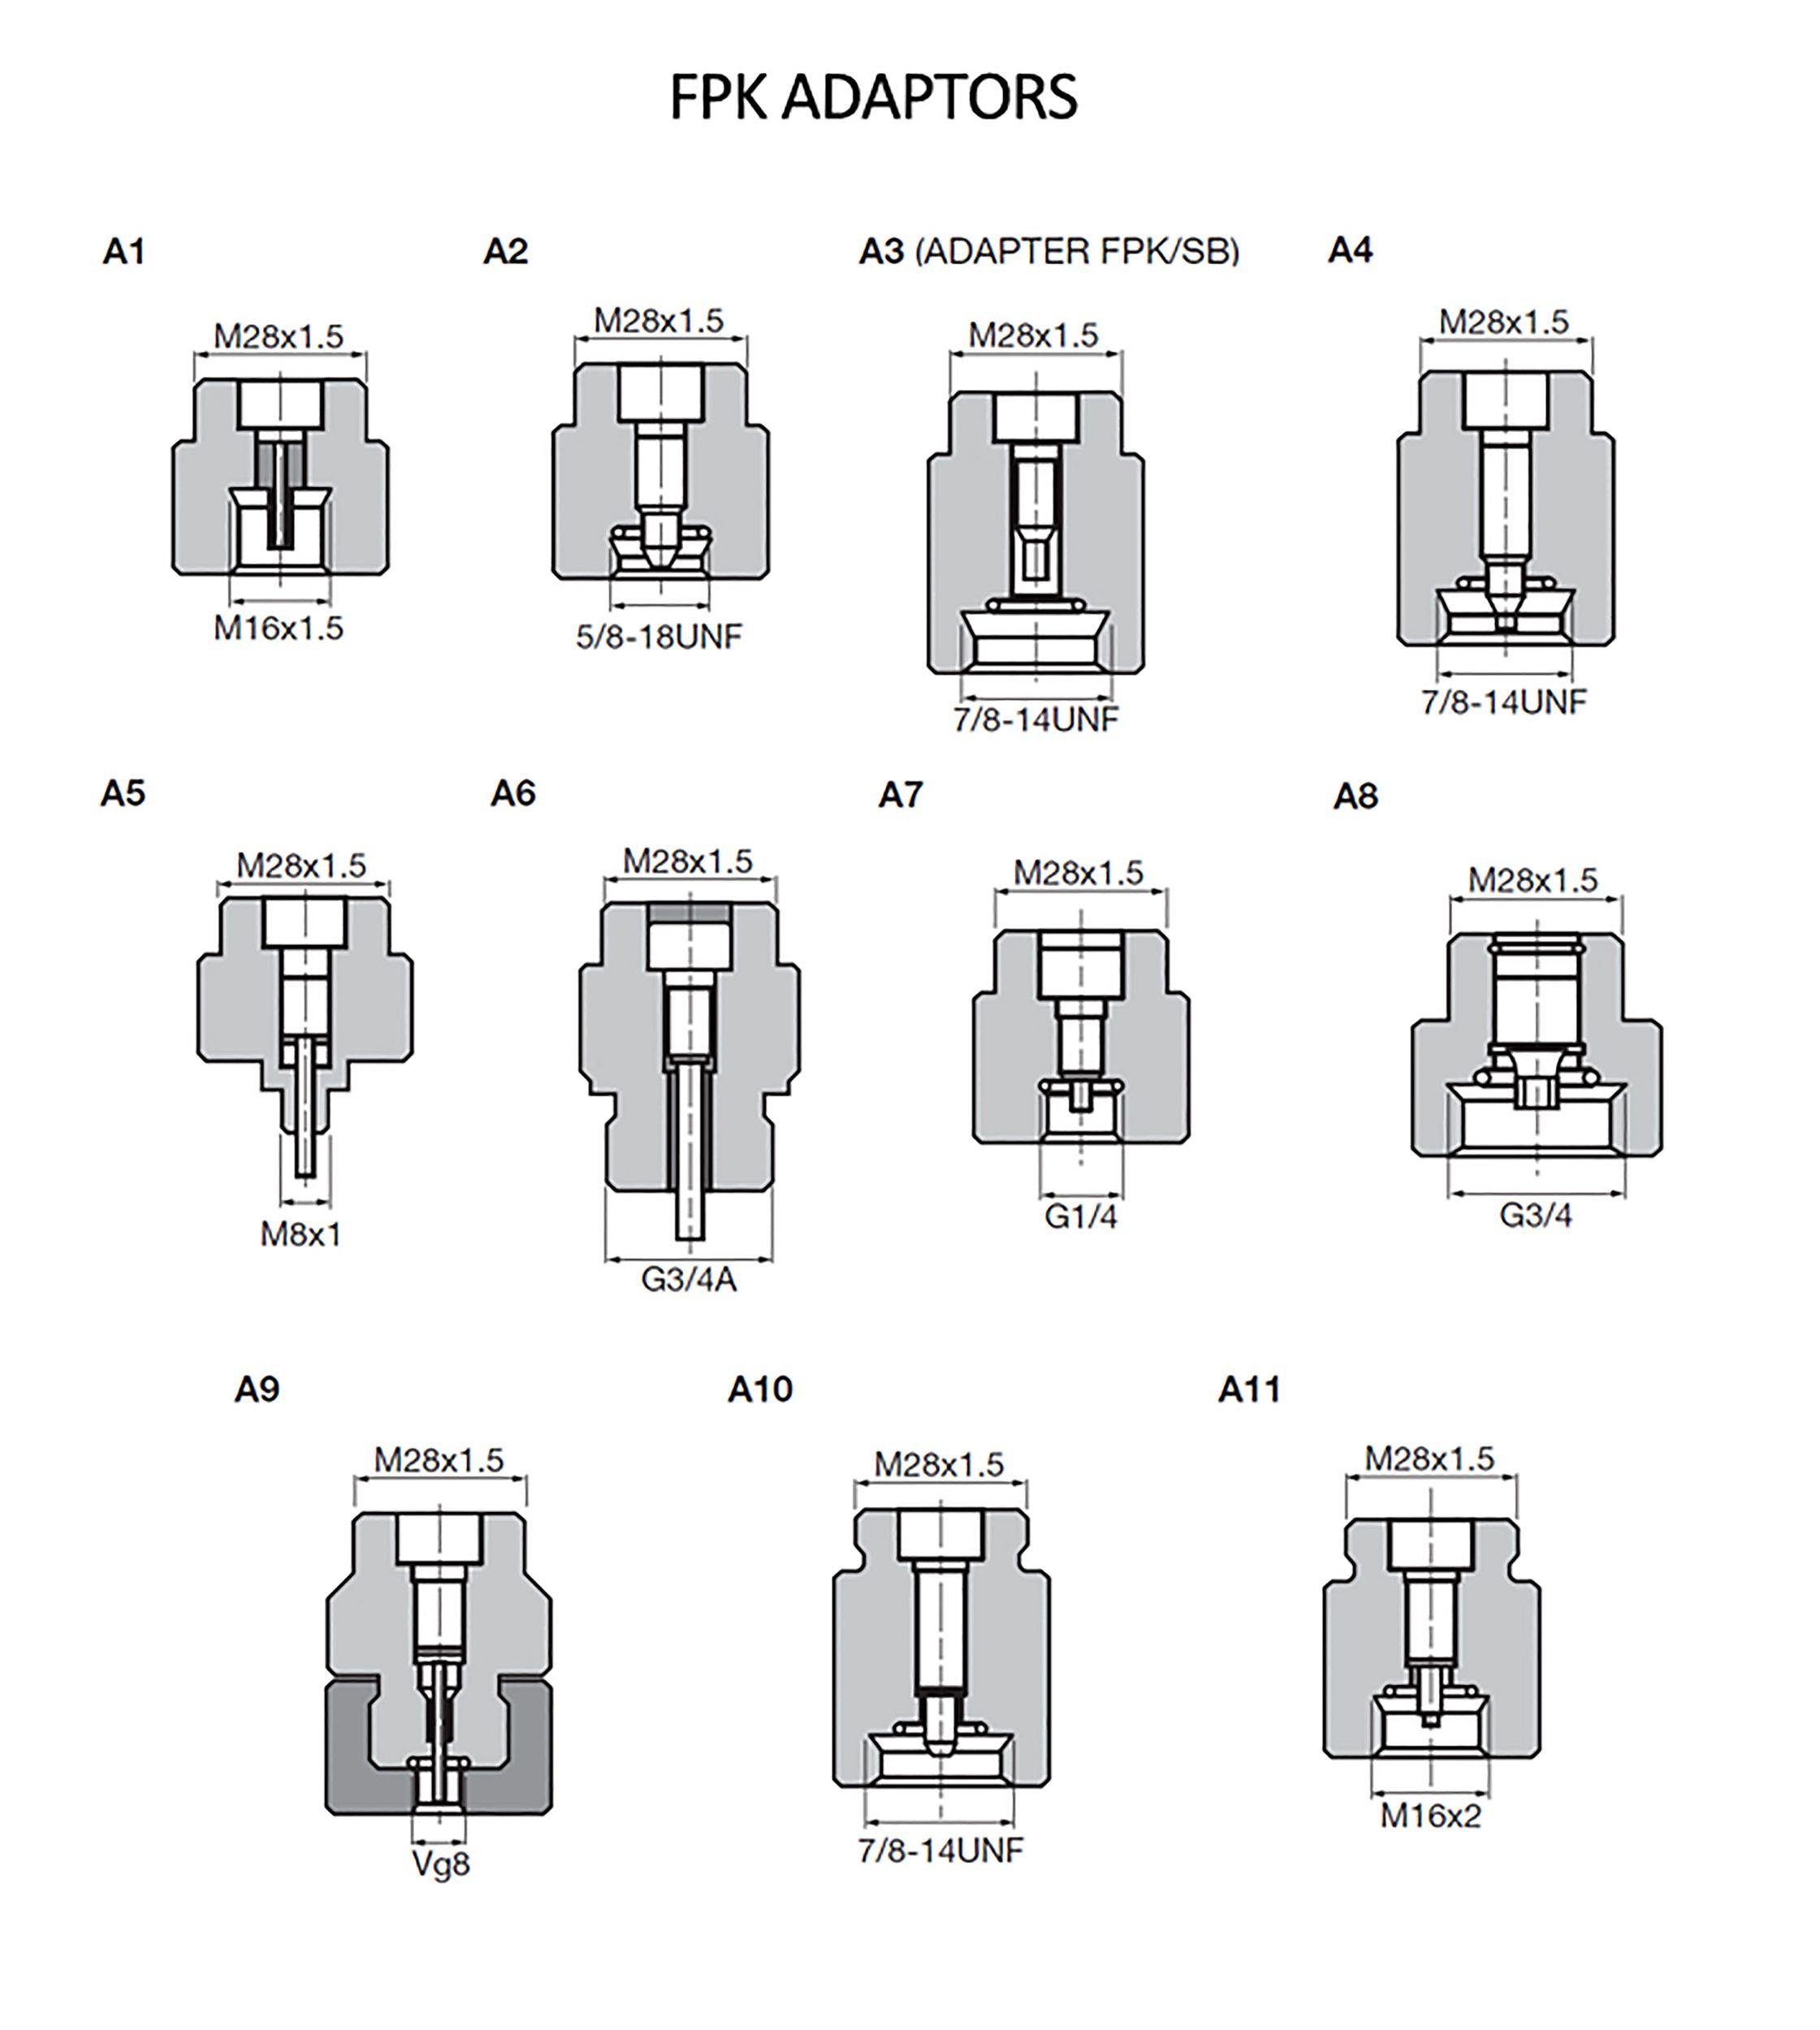 A9 Adaptor